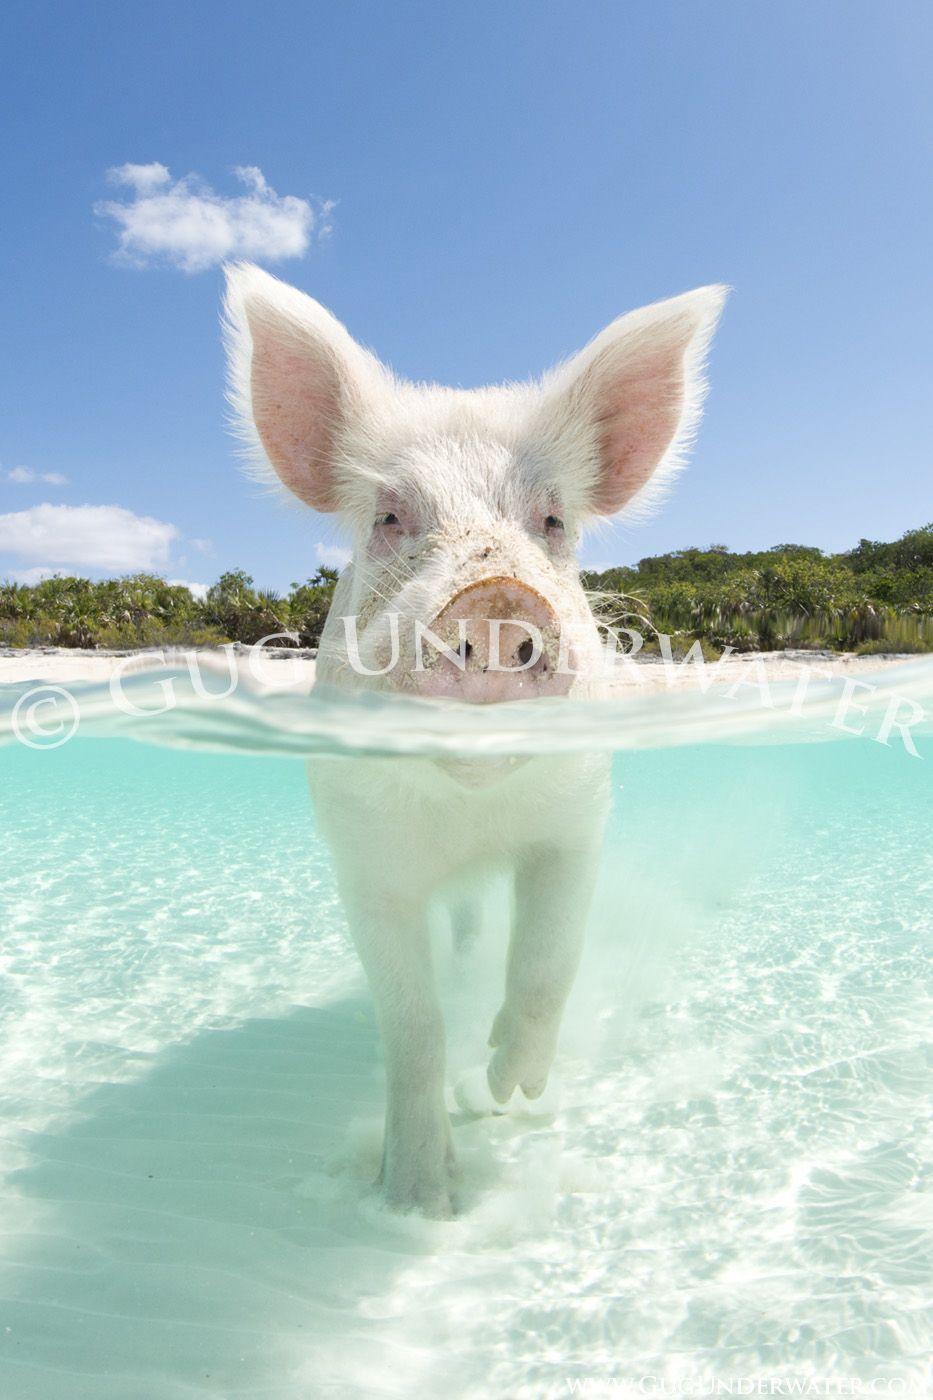 Hog heaven animals beautiful cute pigs cute animals